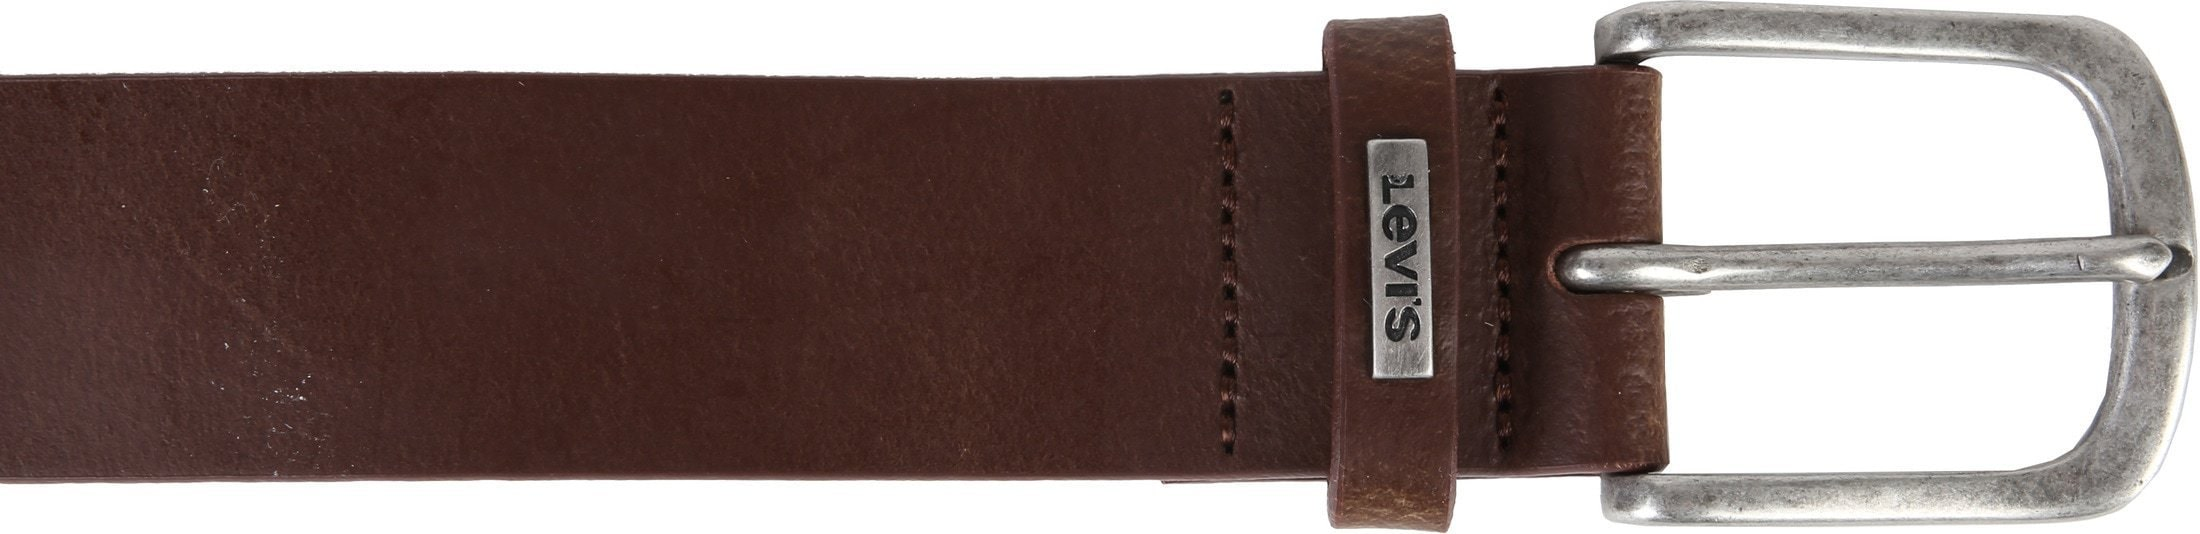 Levi's  Lev 8 Leather Belt Brown foto 1